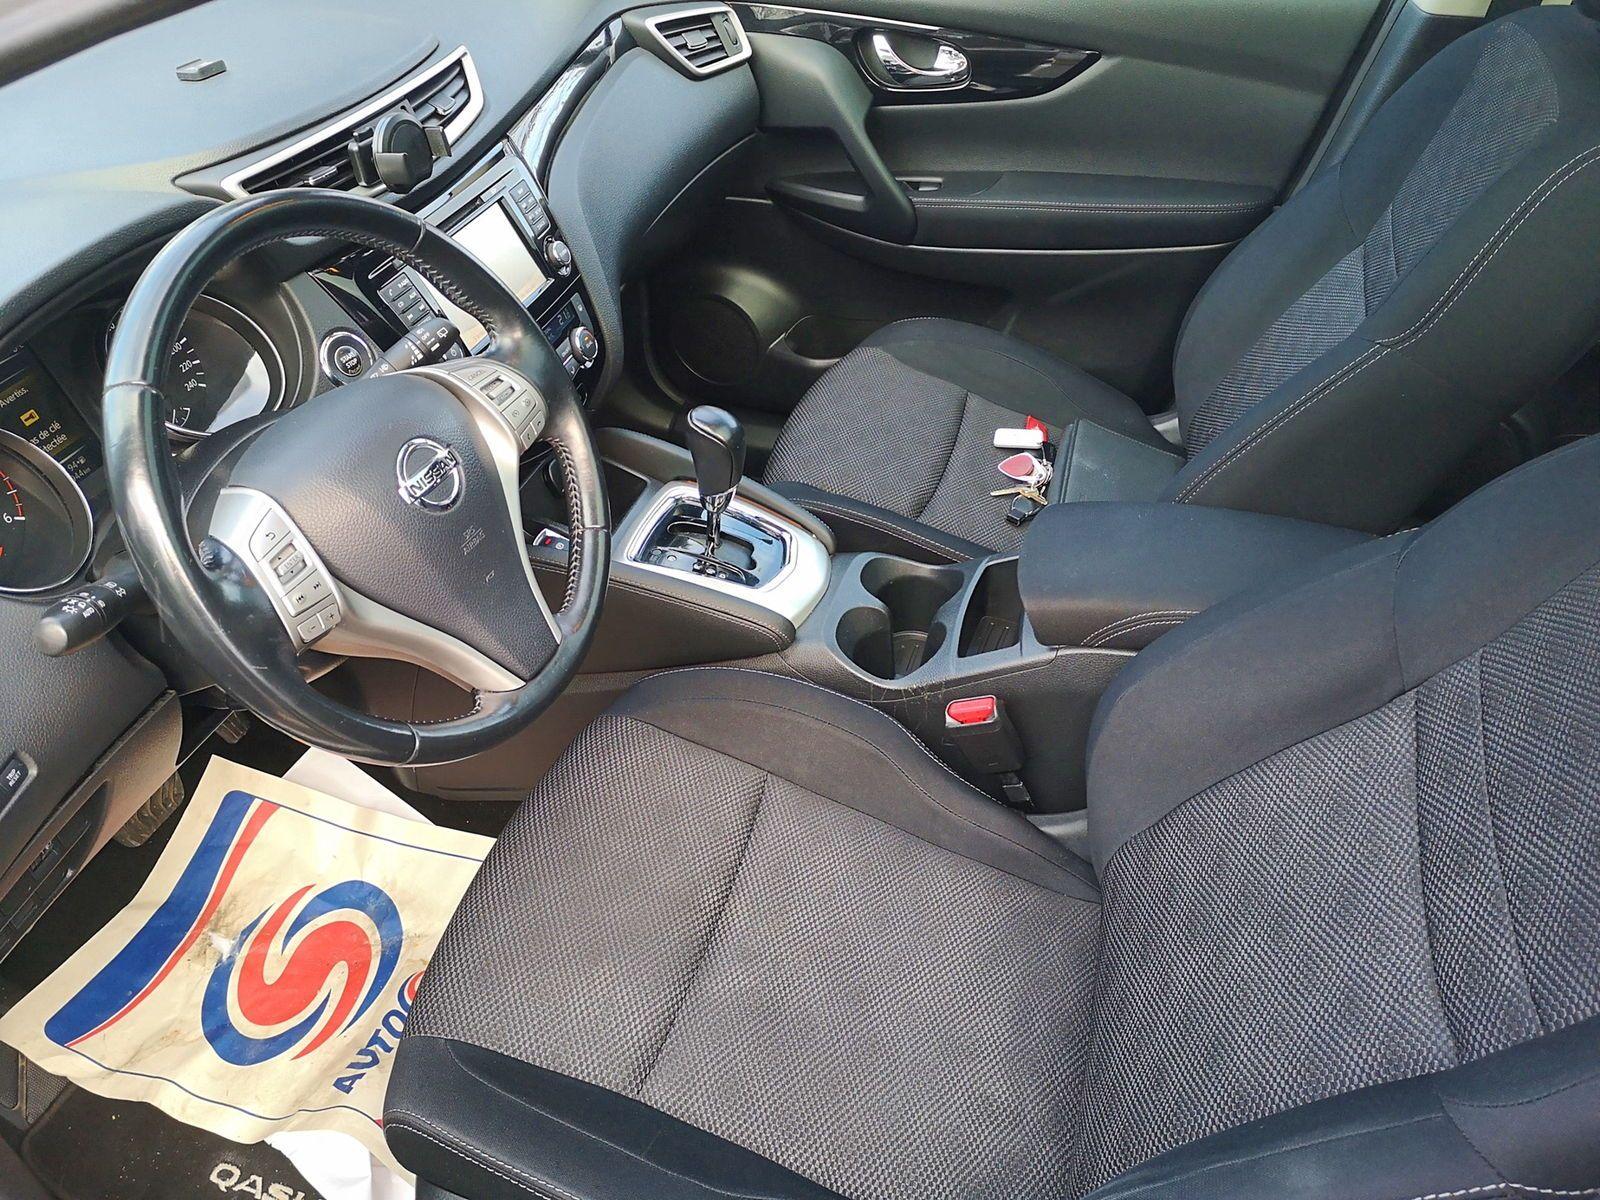 Vends Qashqaï Nissan - 2014, 144000km